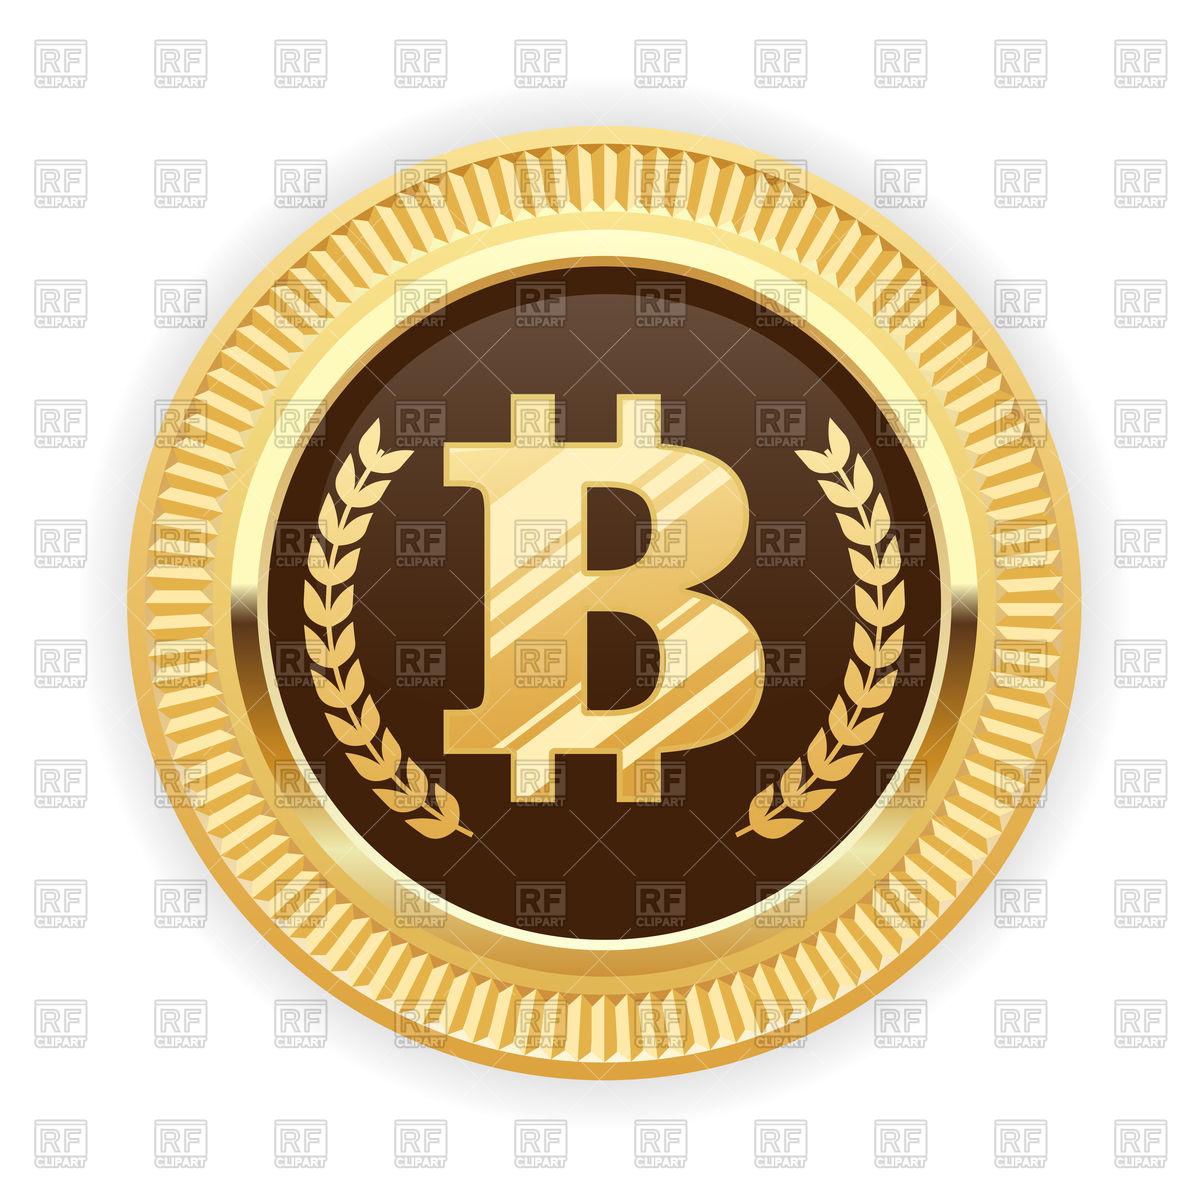 Bitcoin symbol on gold medal.